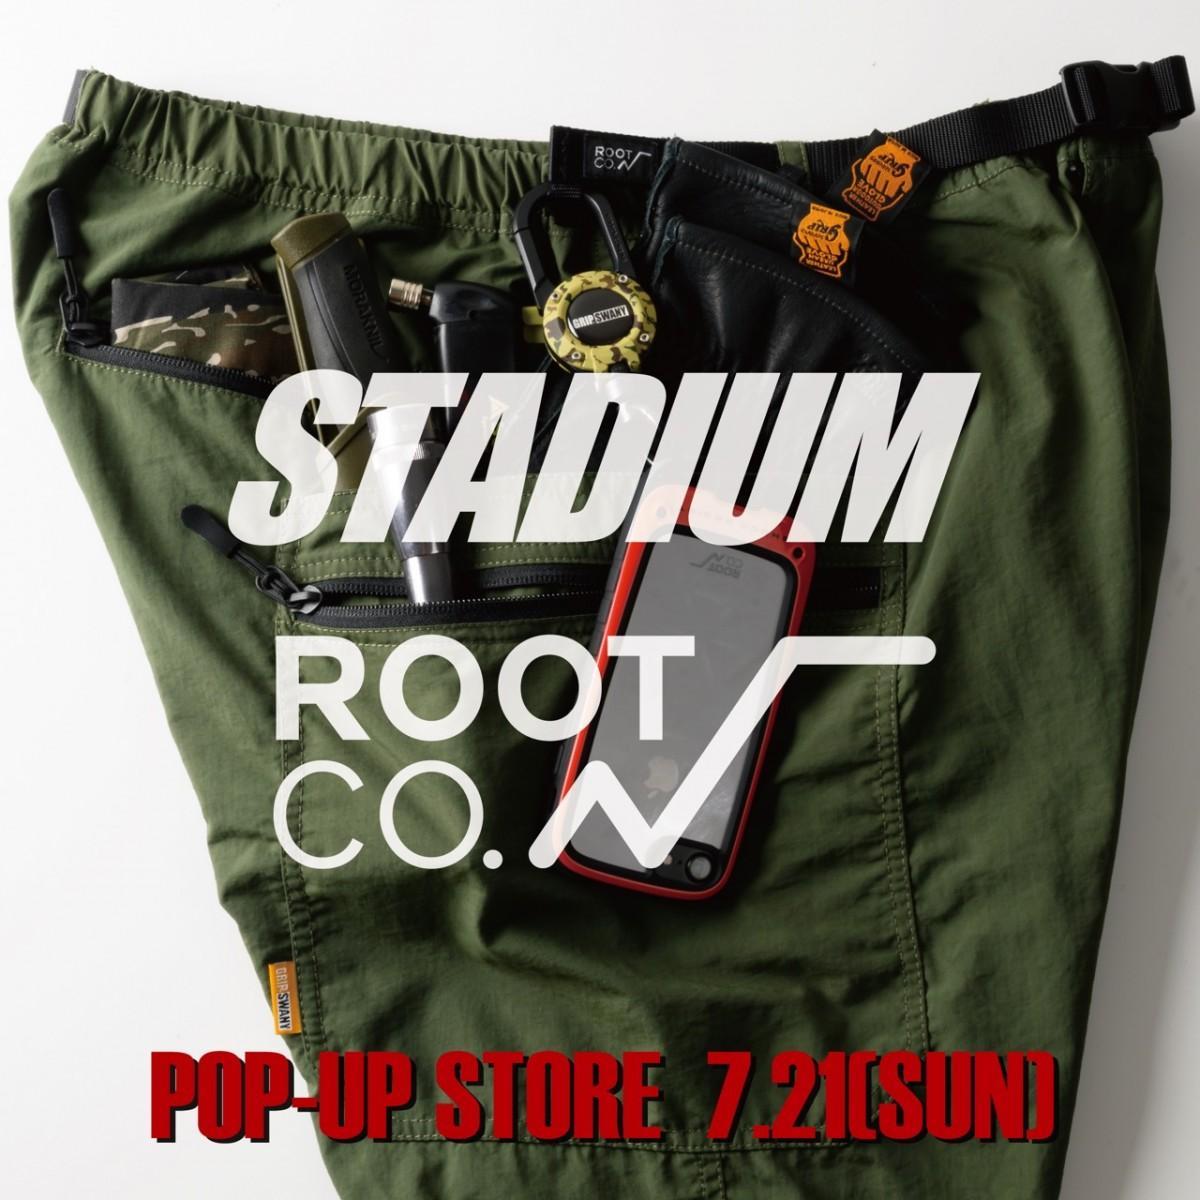 「First & Stadium」にROOT CO、GRIPSWANYのポップアップストア開店の訴求ビジュアル